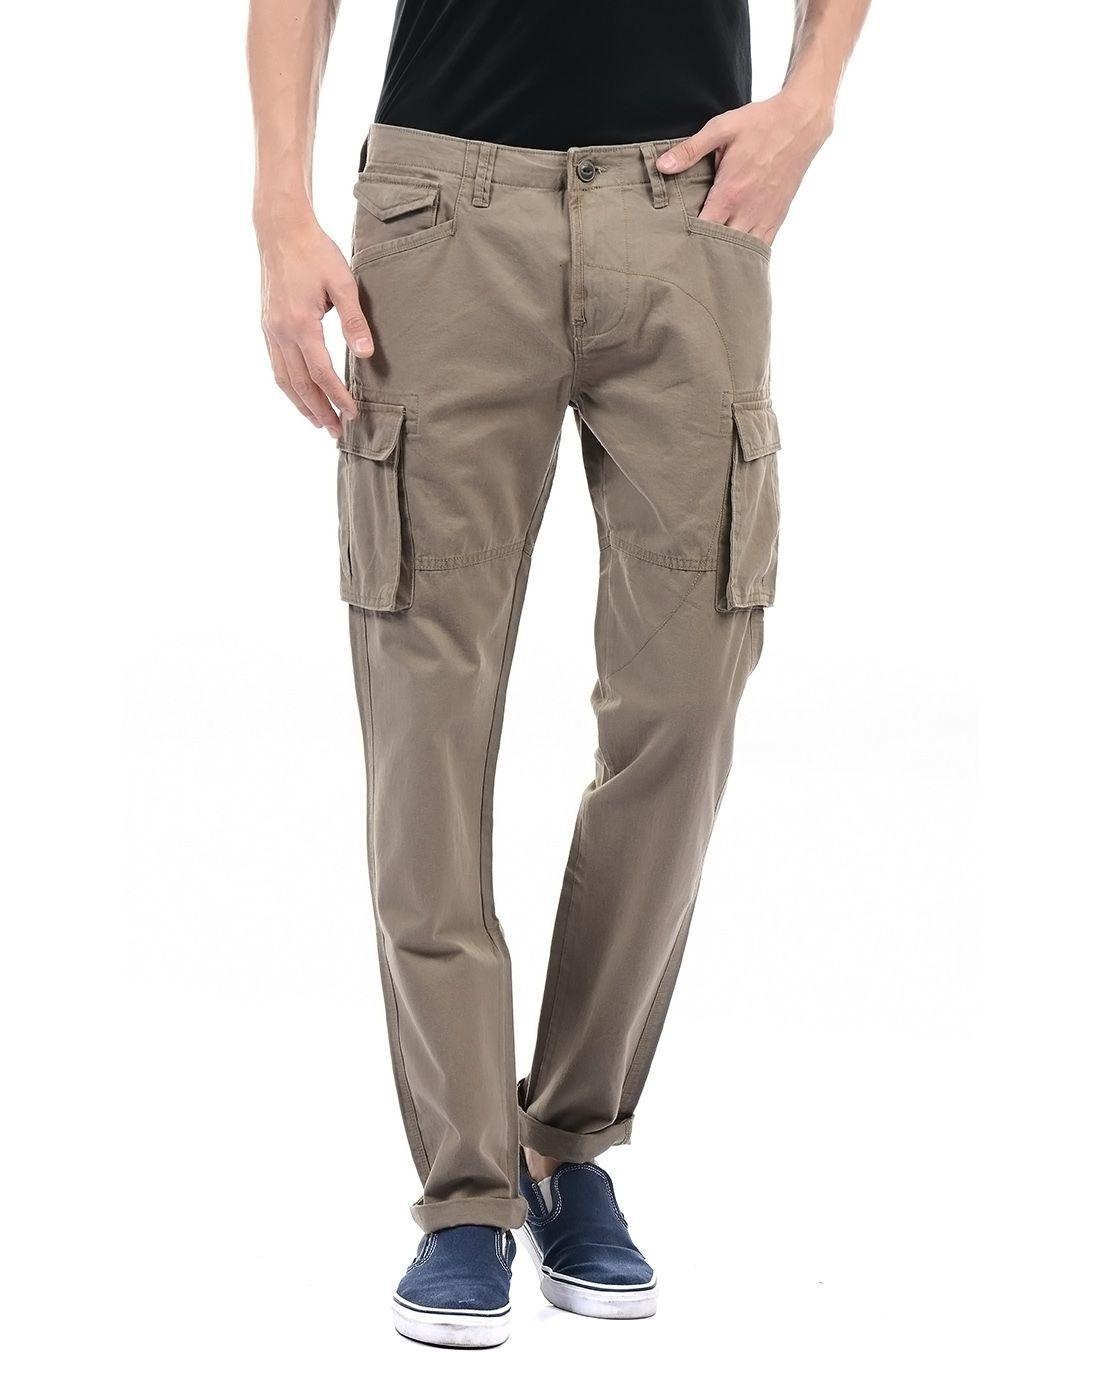 Pepe Jeans Brown Regular -Fit Flat Cargos